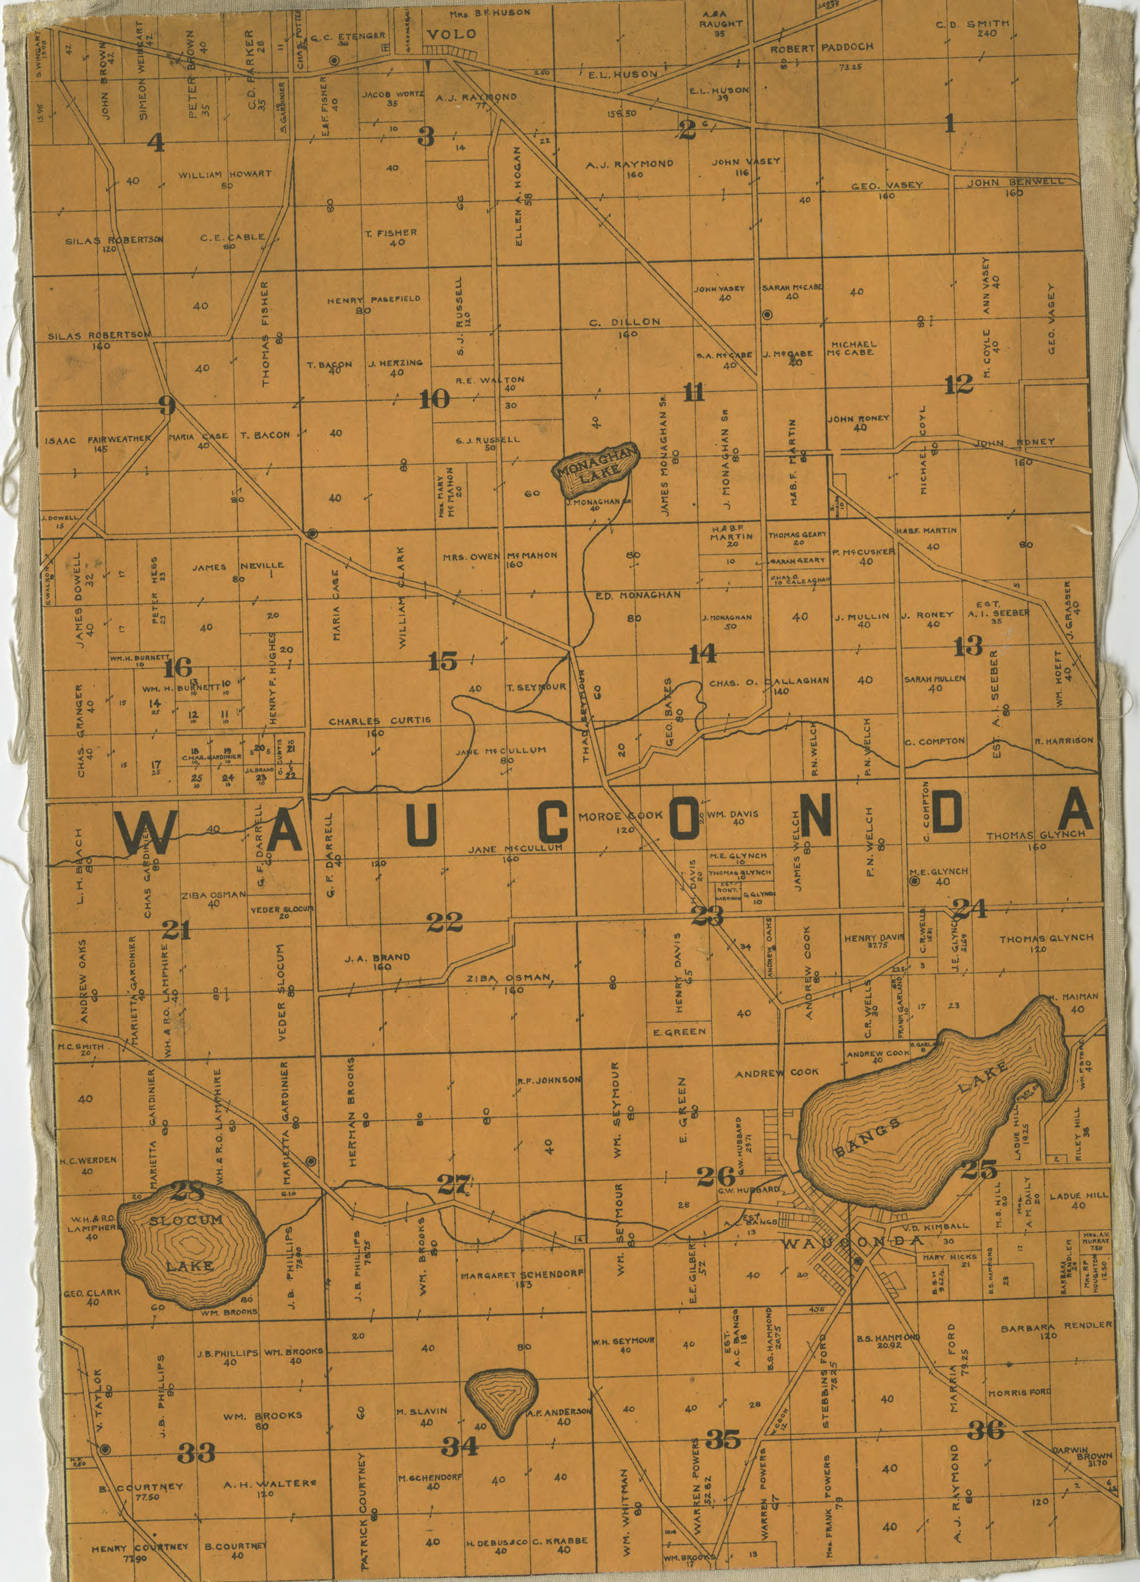 C:\Users\Vern\Documents\Fort Hill\1918 Schools Centennial\1918 Wauconda Twp Glynch School\1918_School_Histories__Wauconda_Township__Glynch_School_2003045_Page_33.jpg